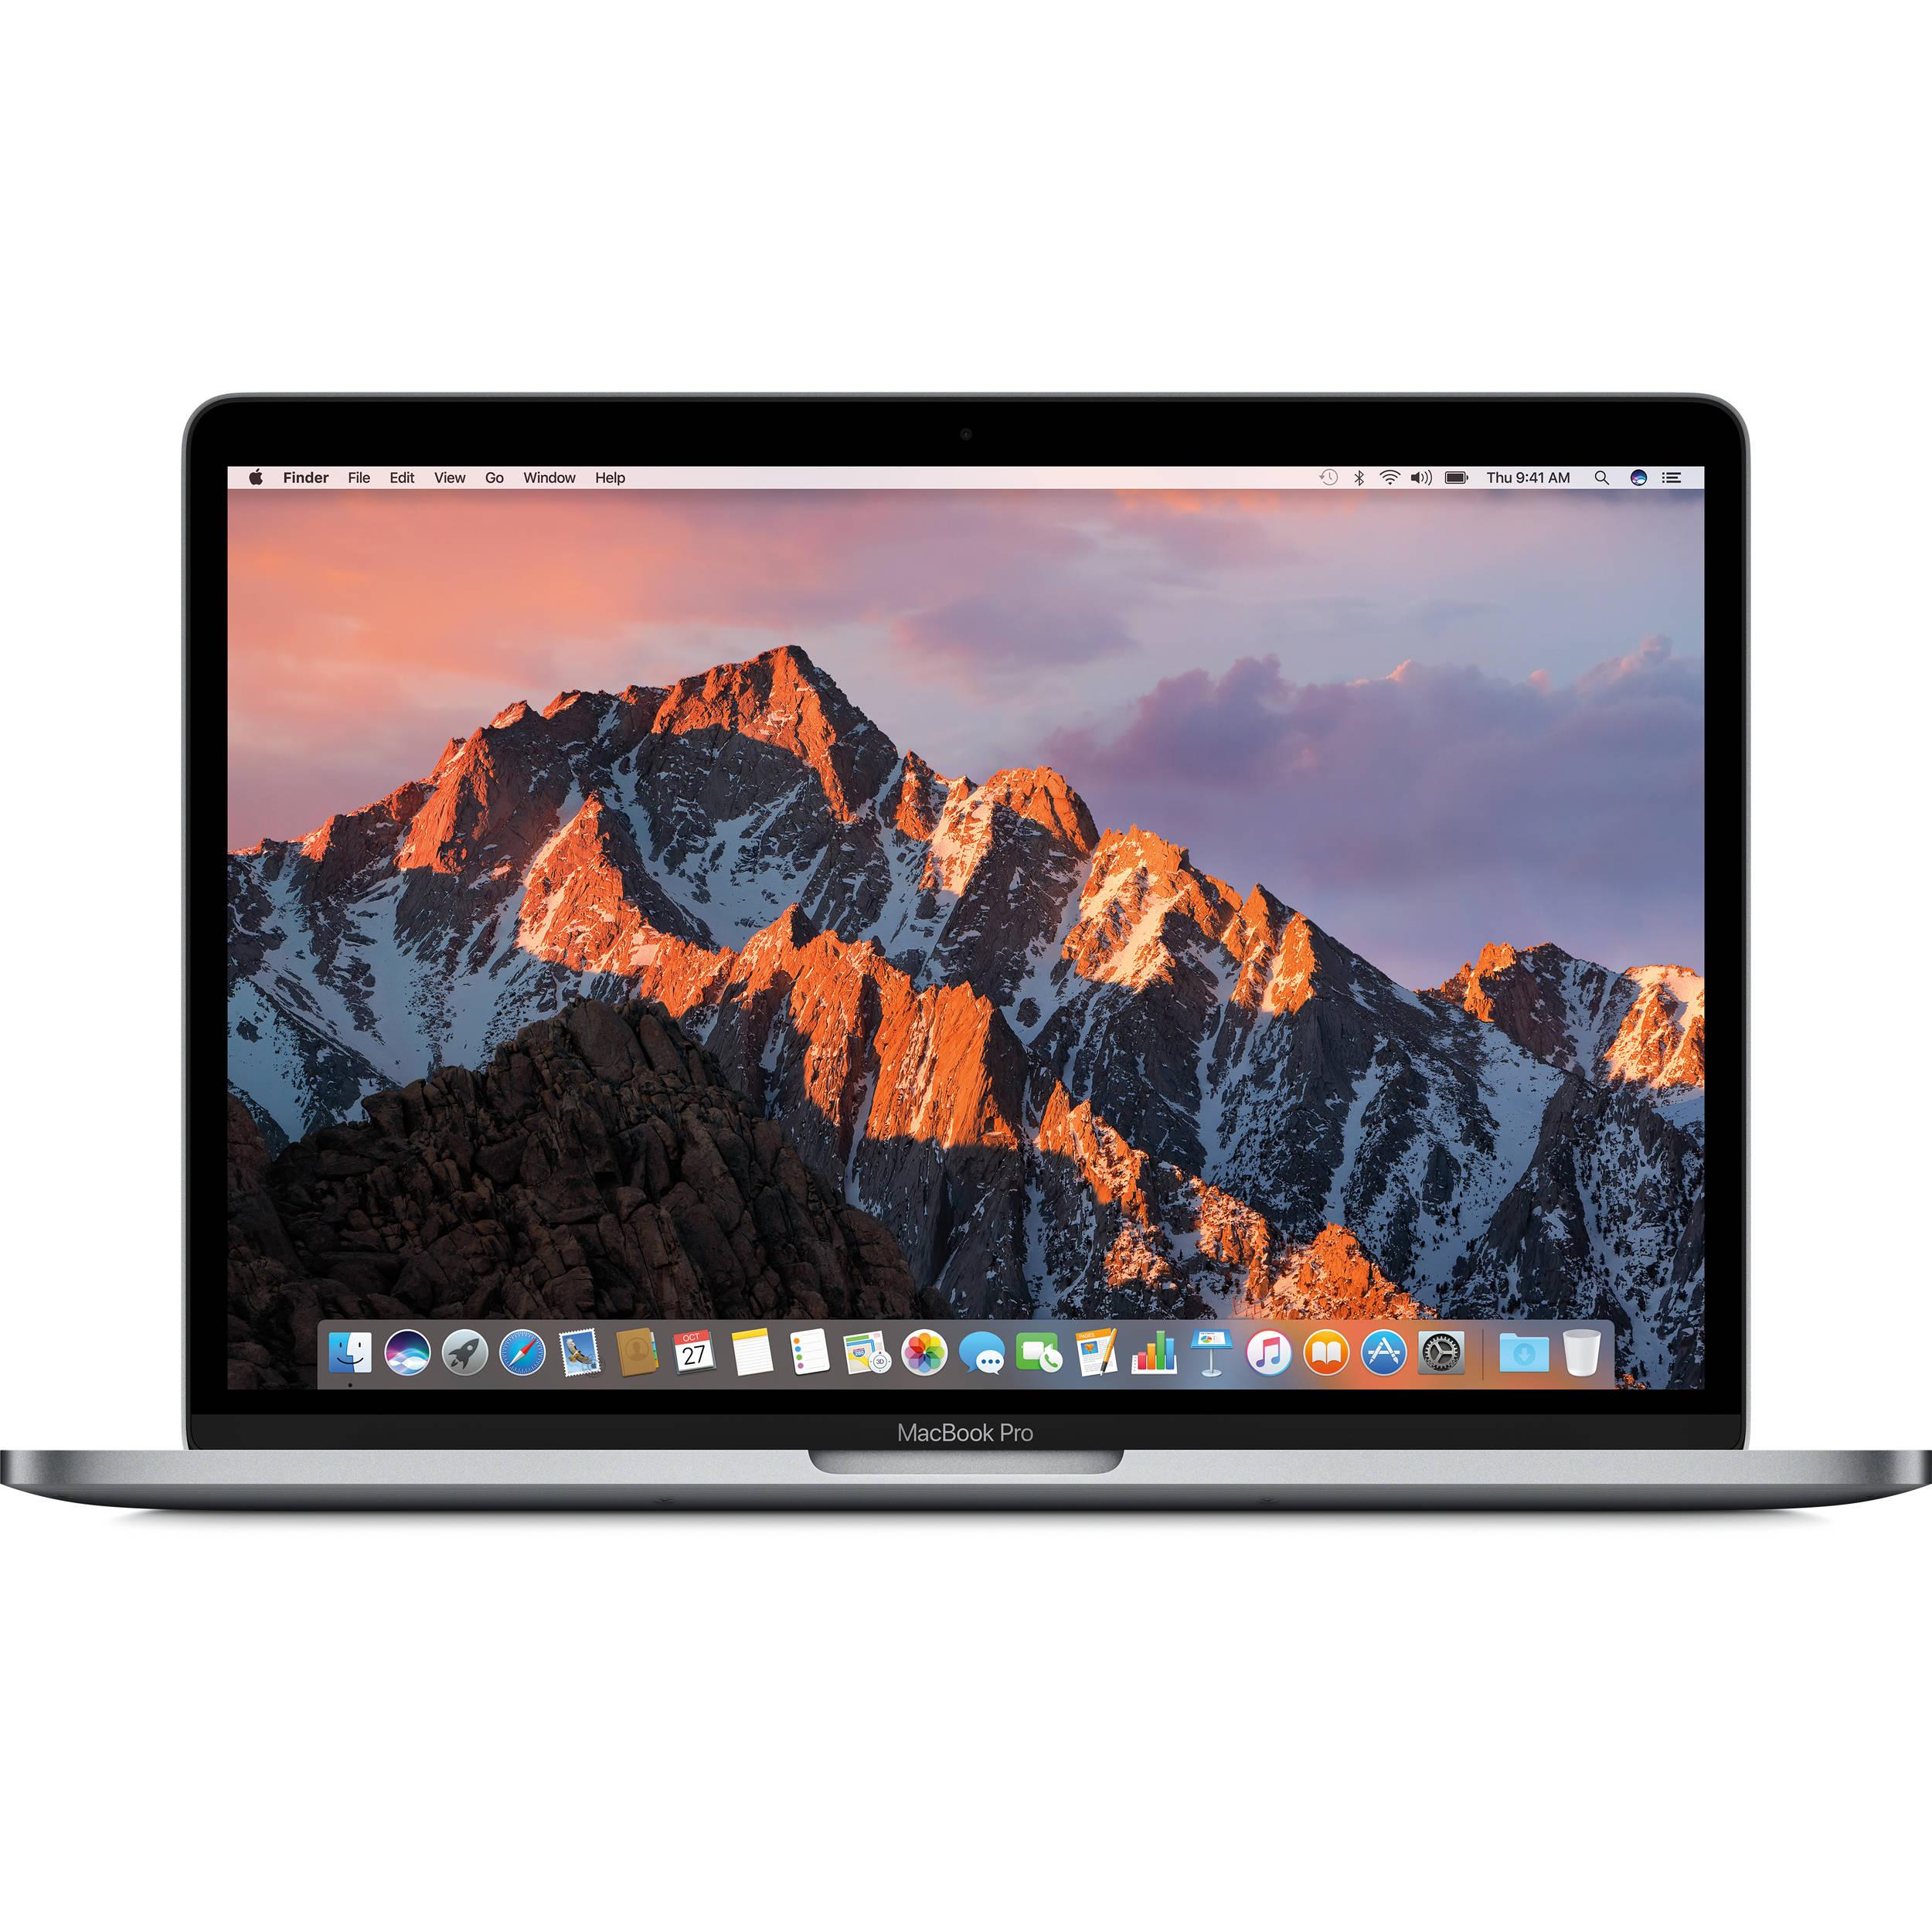 apple 13 3 macbook pro with touch bar z0um0ll a b h photo rh bhphotovideo com apple macbook pro a1278 user manual apple macbook pro user guide 2013